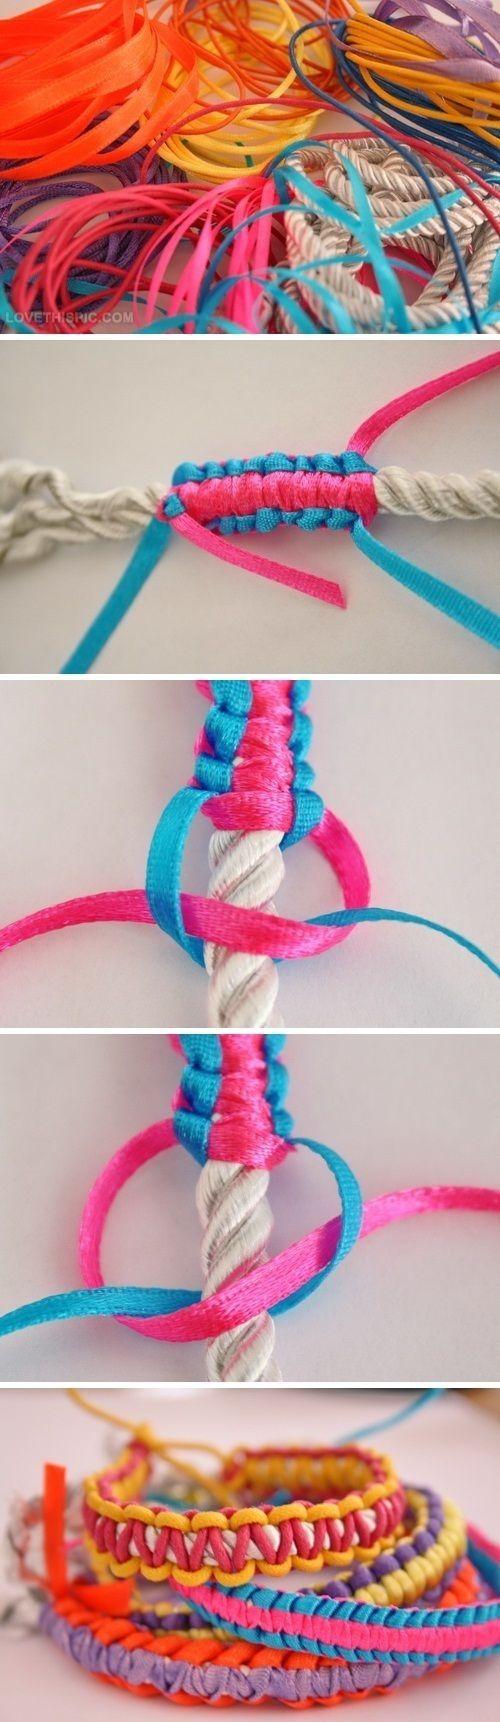 Diy macrame ribbon bracelet bracelet diy diy ideas diy for Diy craft projects easy